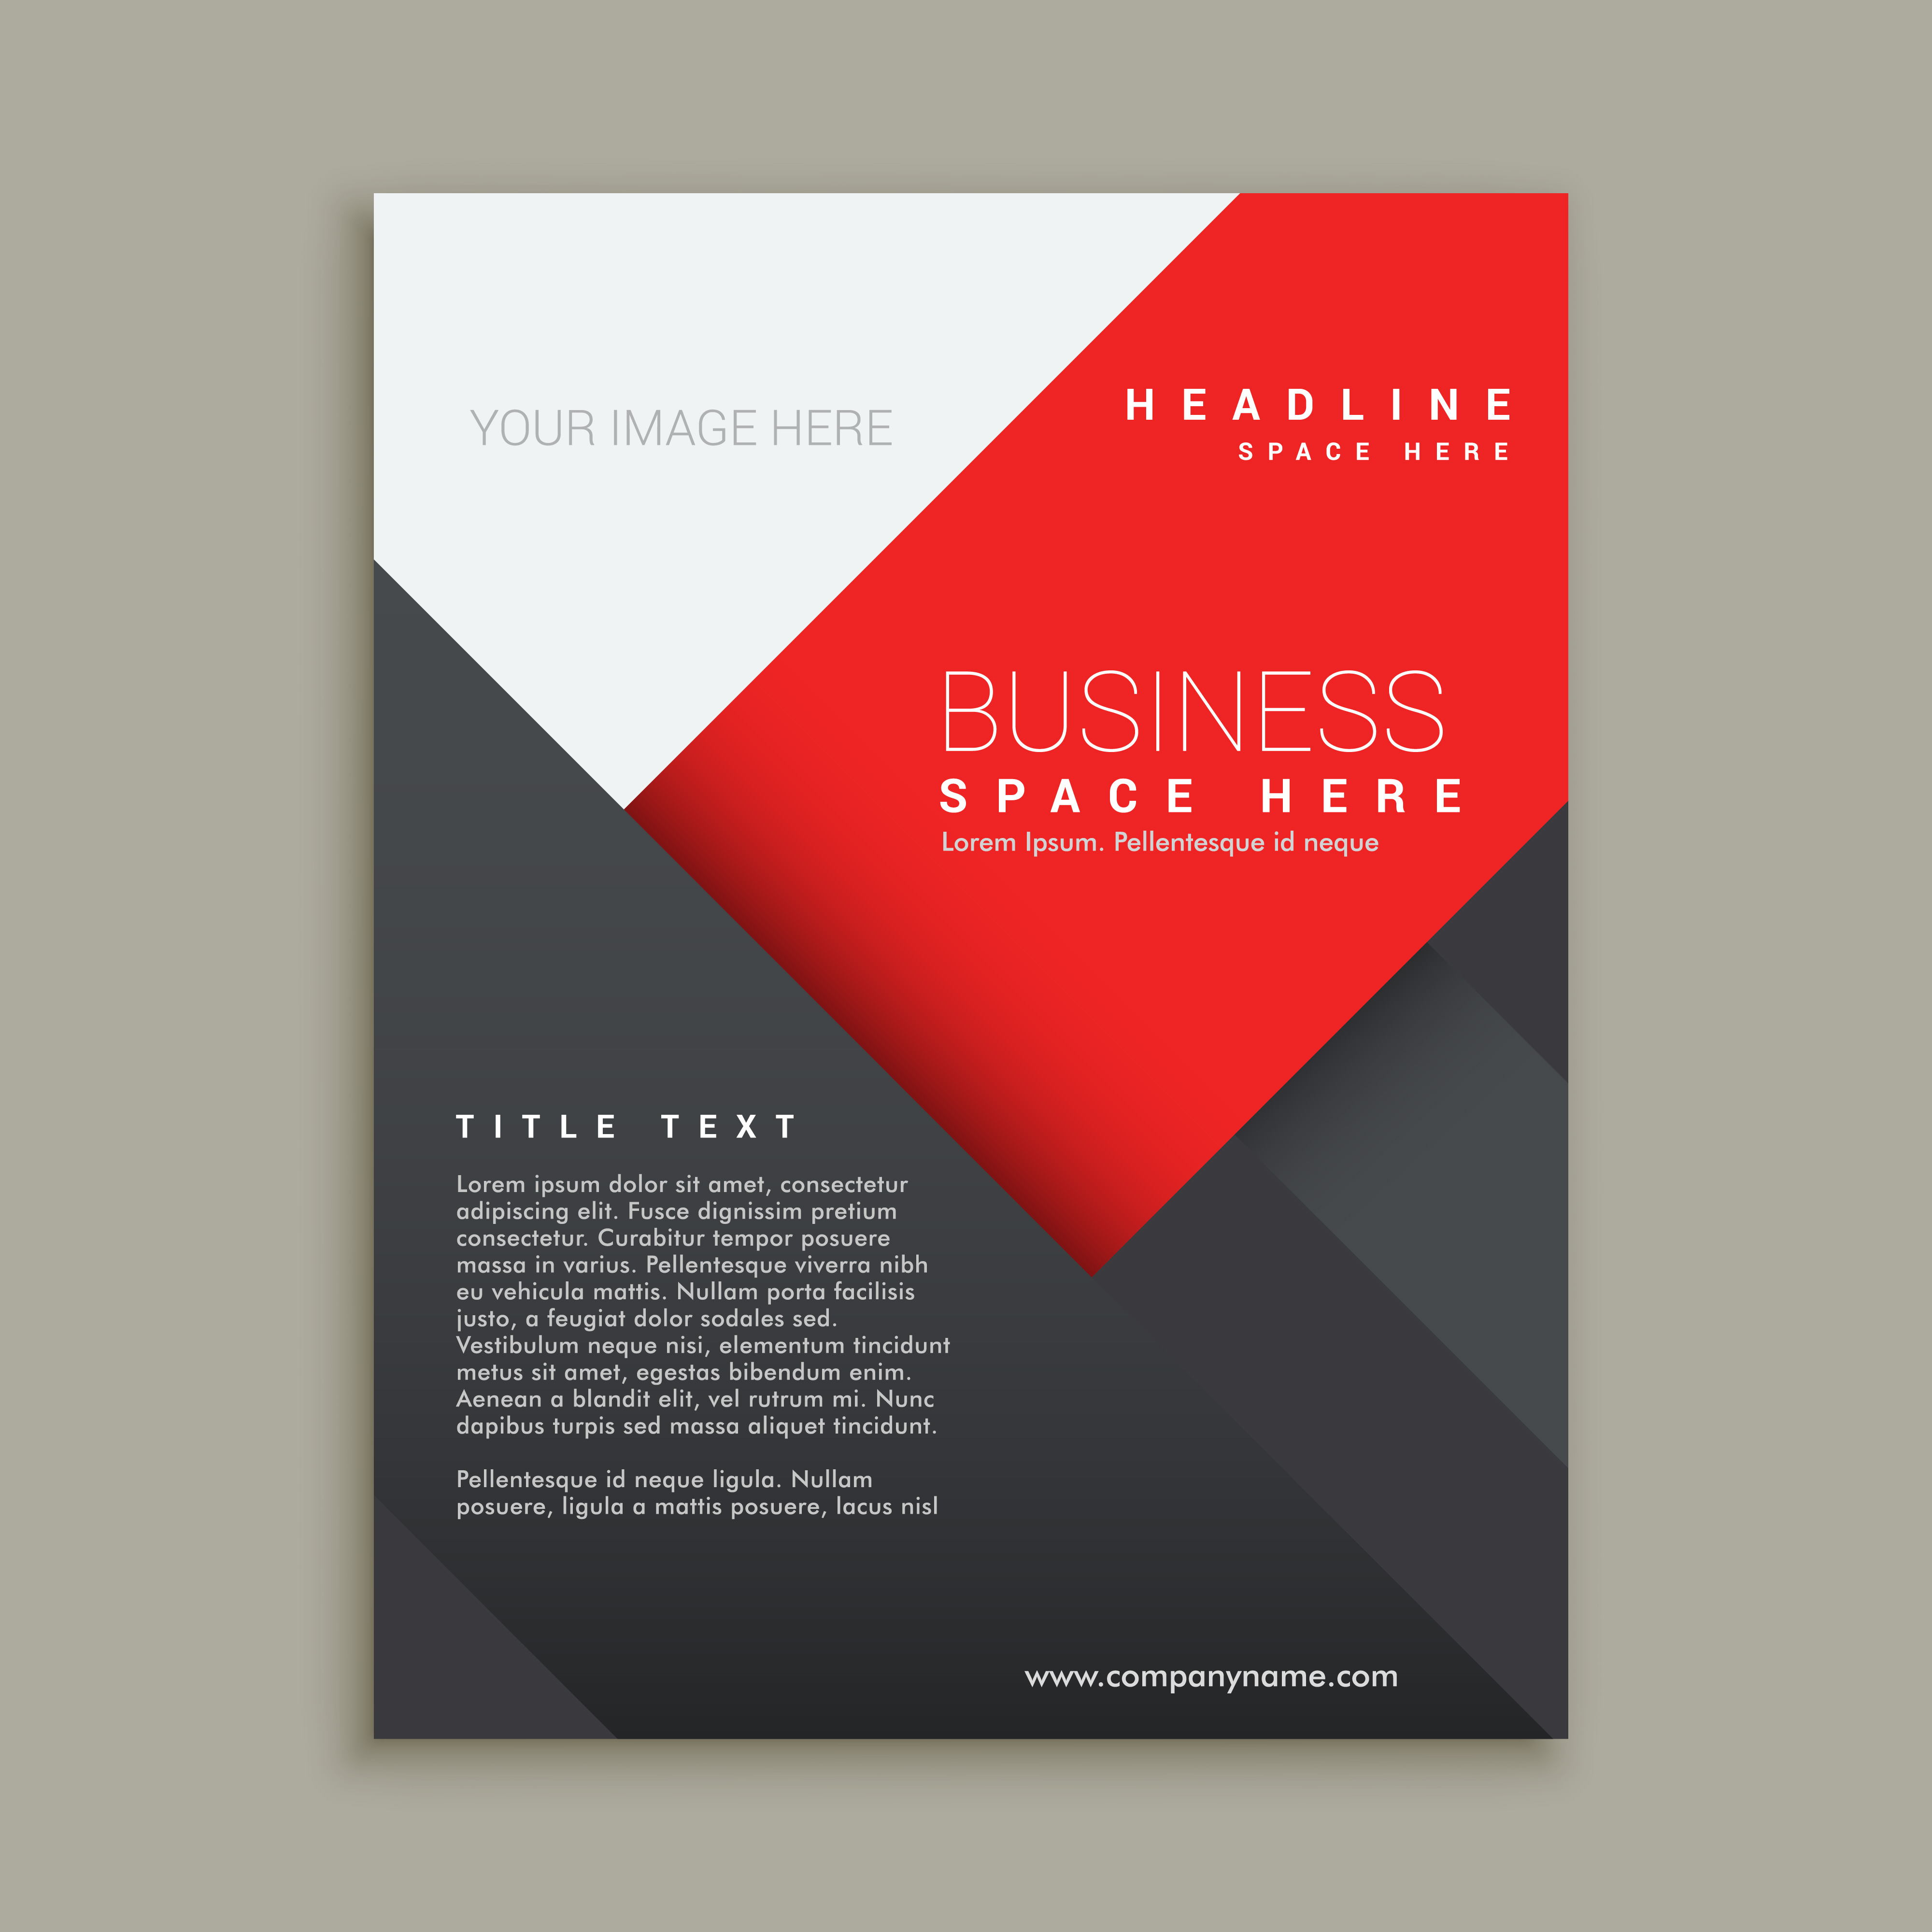 minimal business brochure template design  Download Free Vector Art Stock Graphics  Images